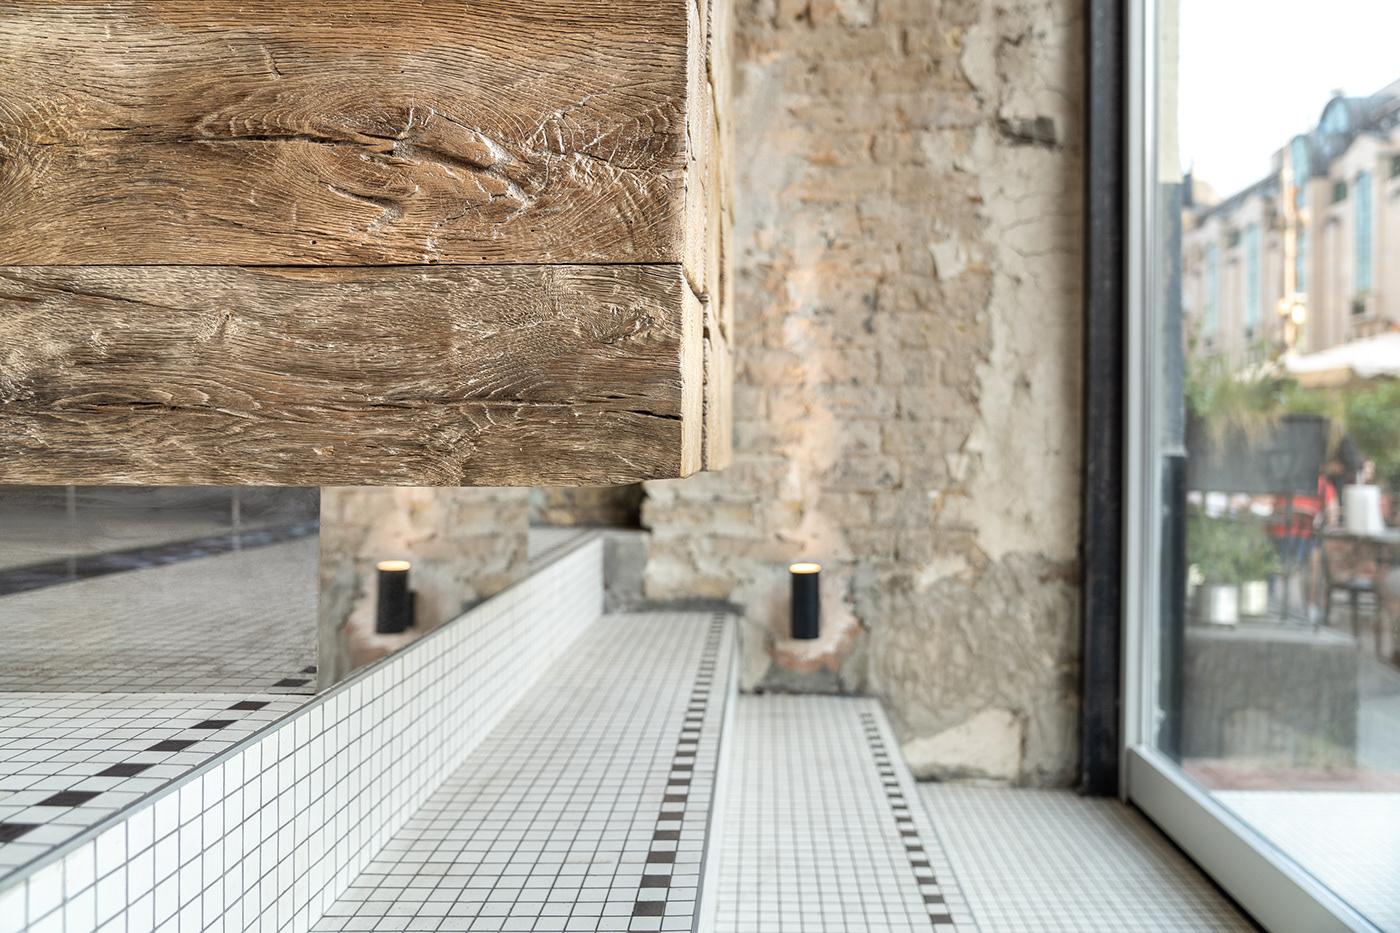 3ds max architecture building design Interior interior design  visualization